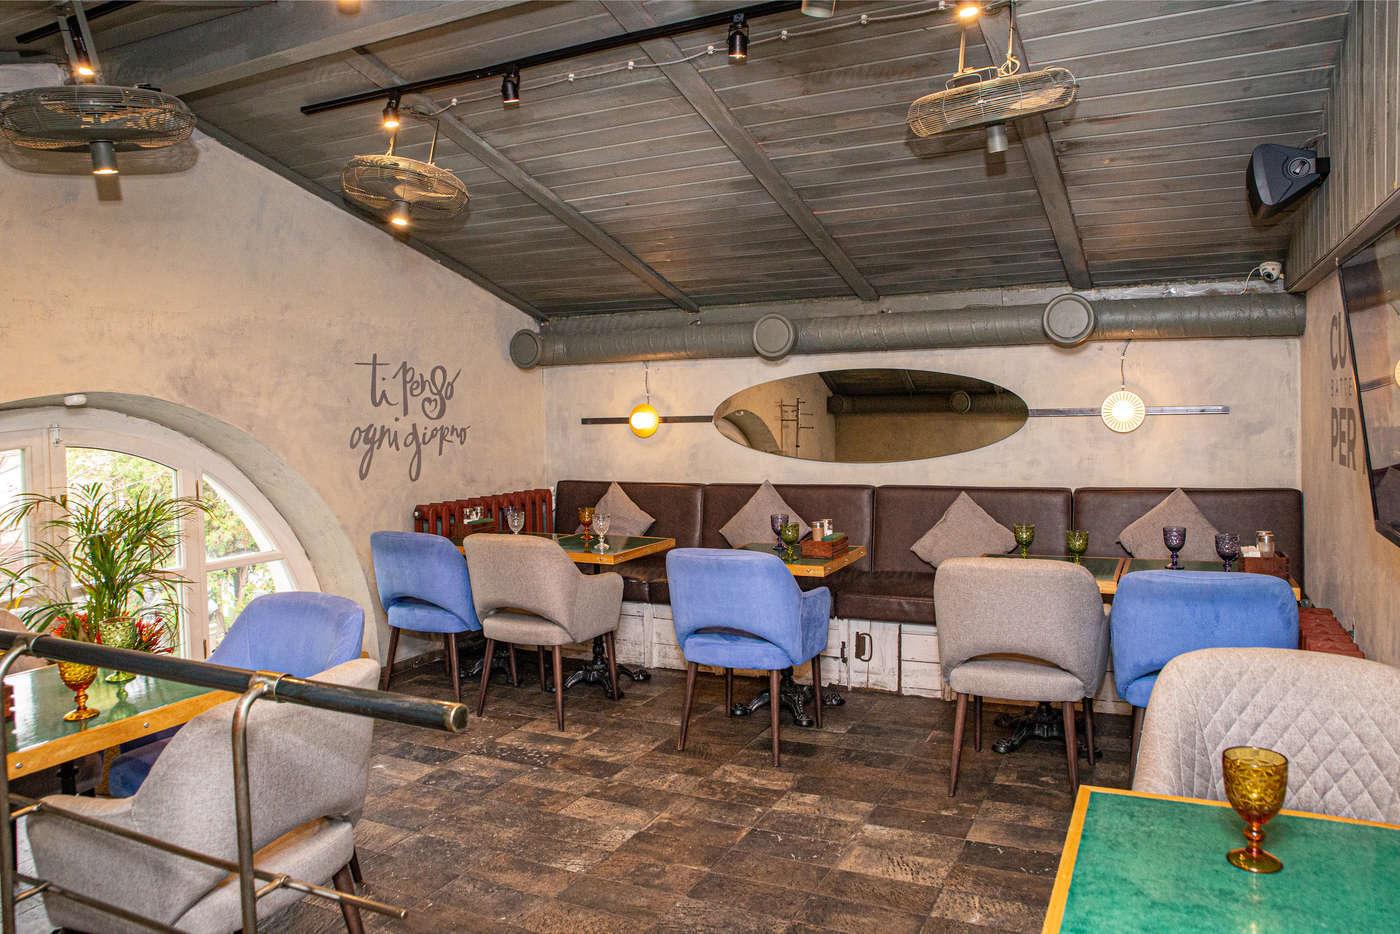 Ресторан IL LETTERATO (Литератор) в Петроверигском переулке фото 37